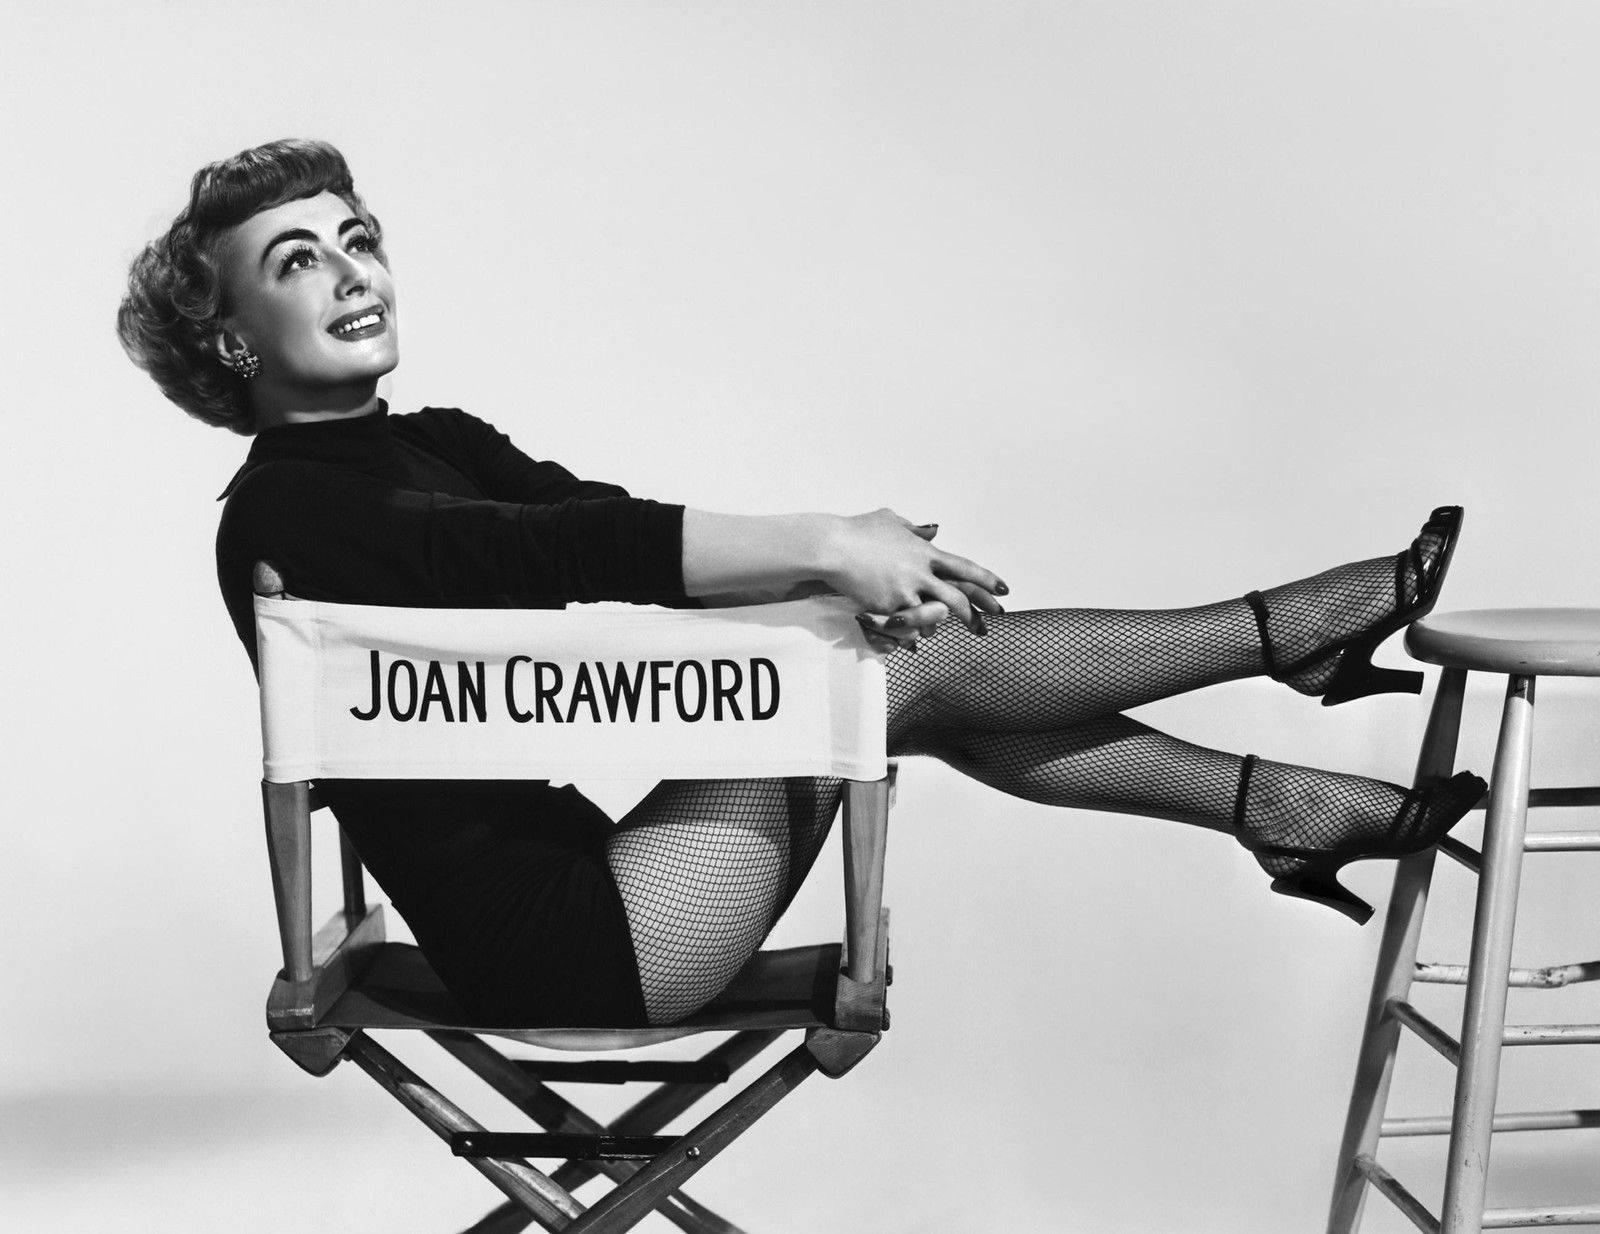 chi era joan crawford